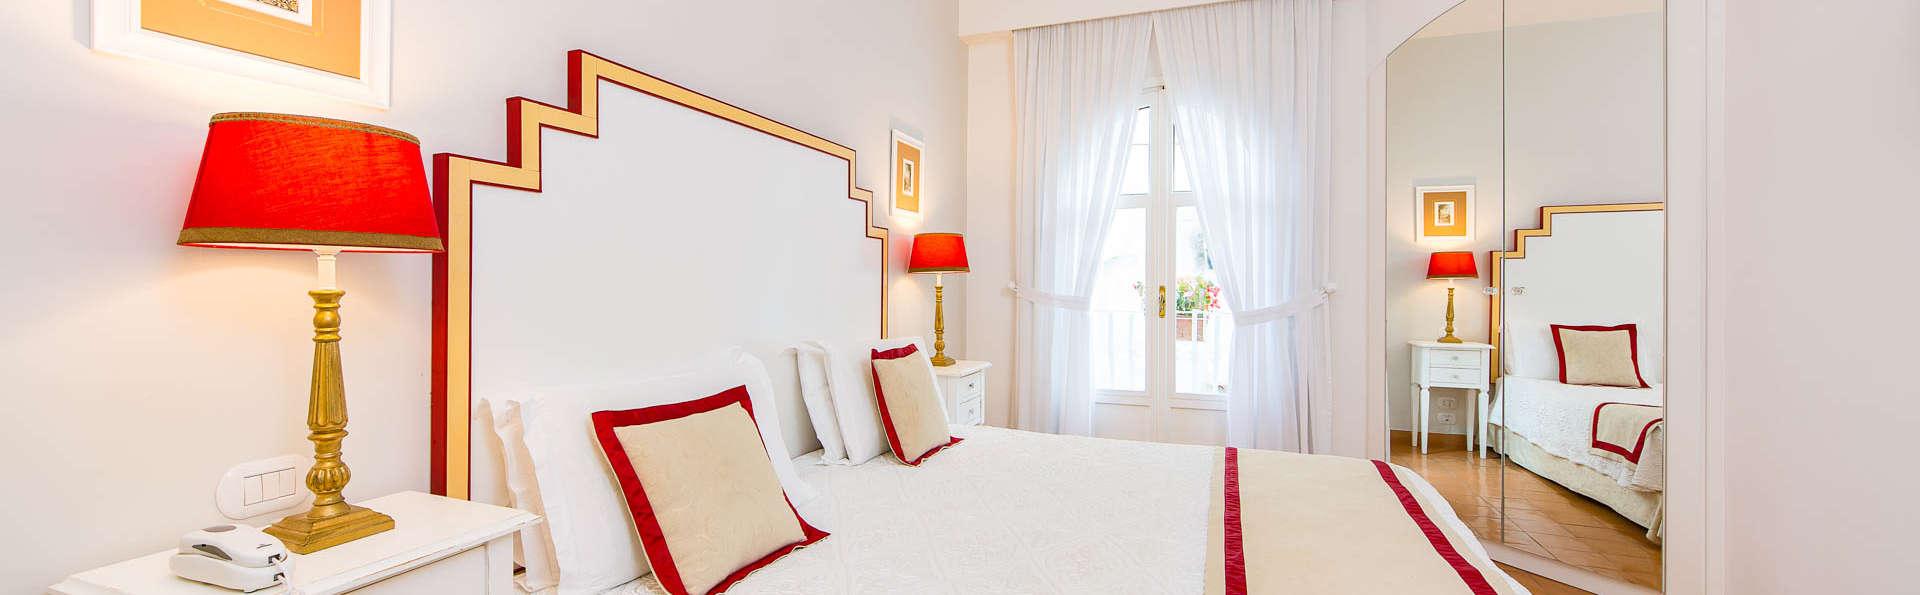 Hotel Villa Romana - EDIT_NEW_CLASSIC3.jpg